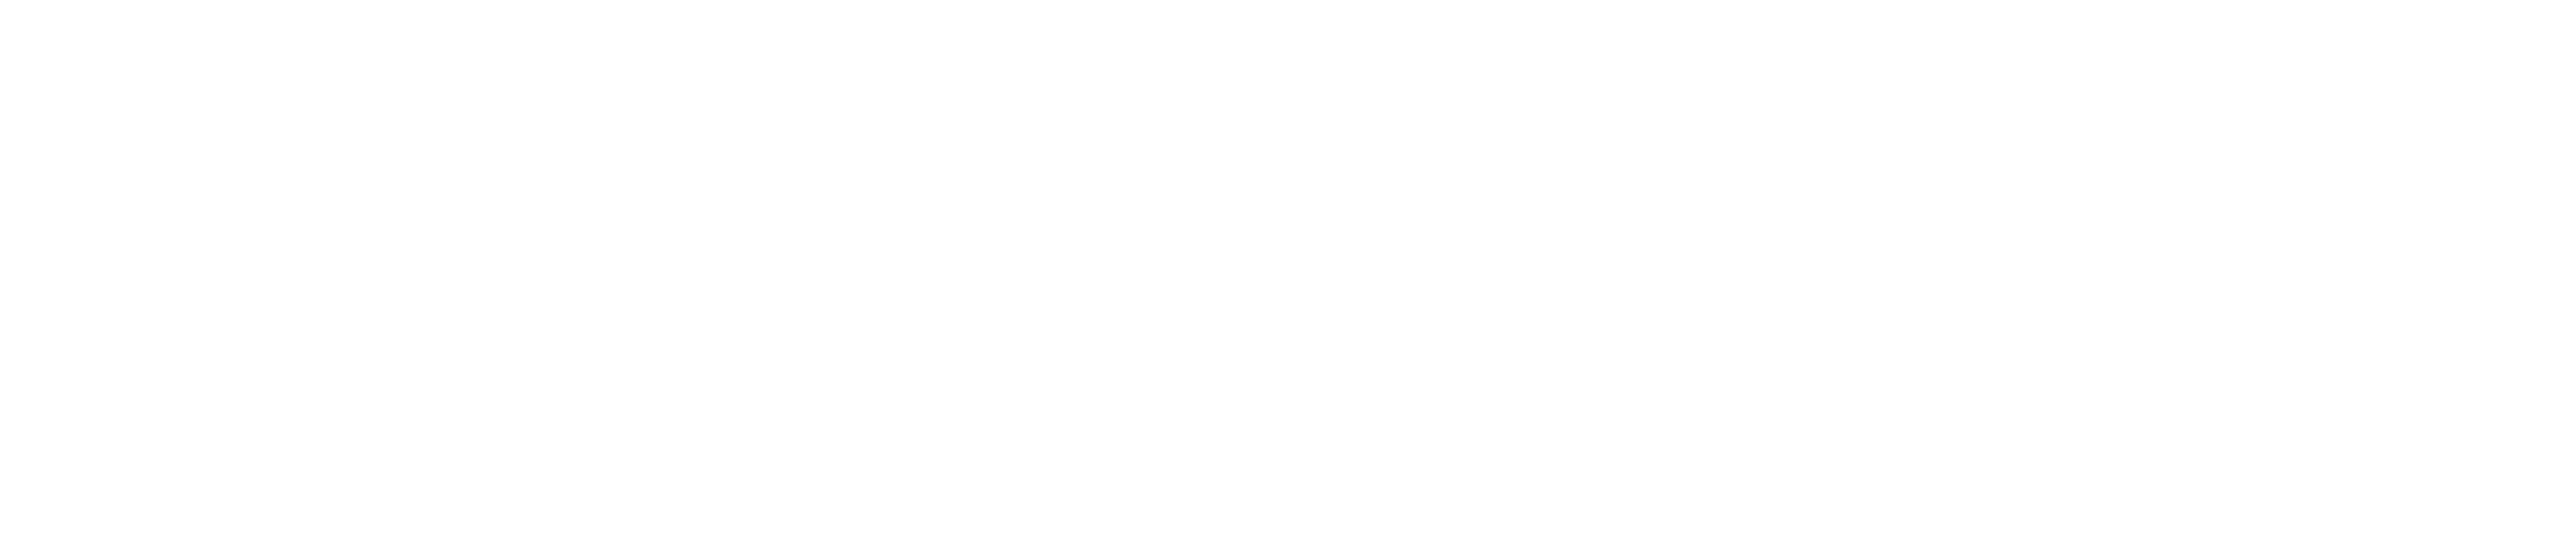 revalue 【はちみつ】【蜂蜜酒(ミード)】情報メディア